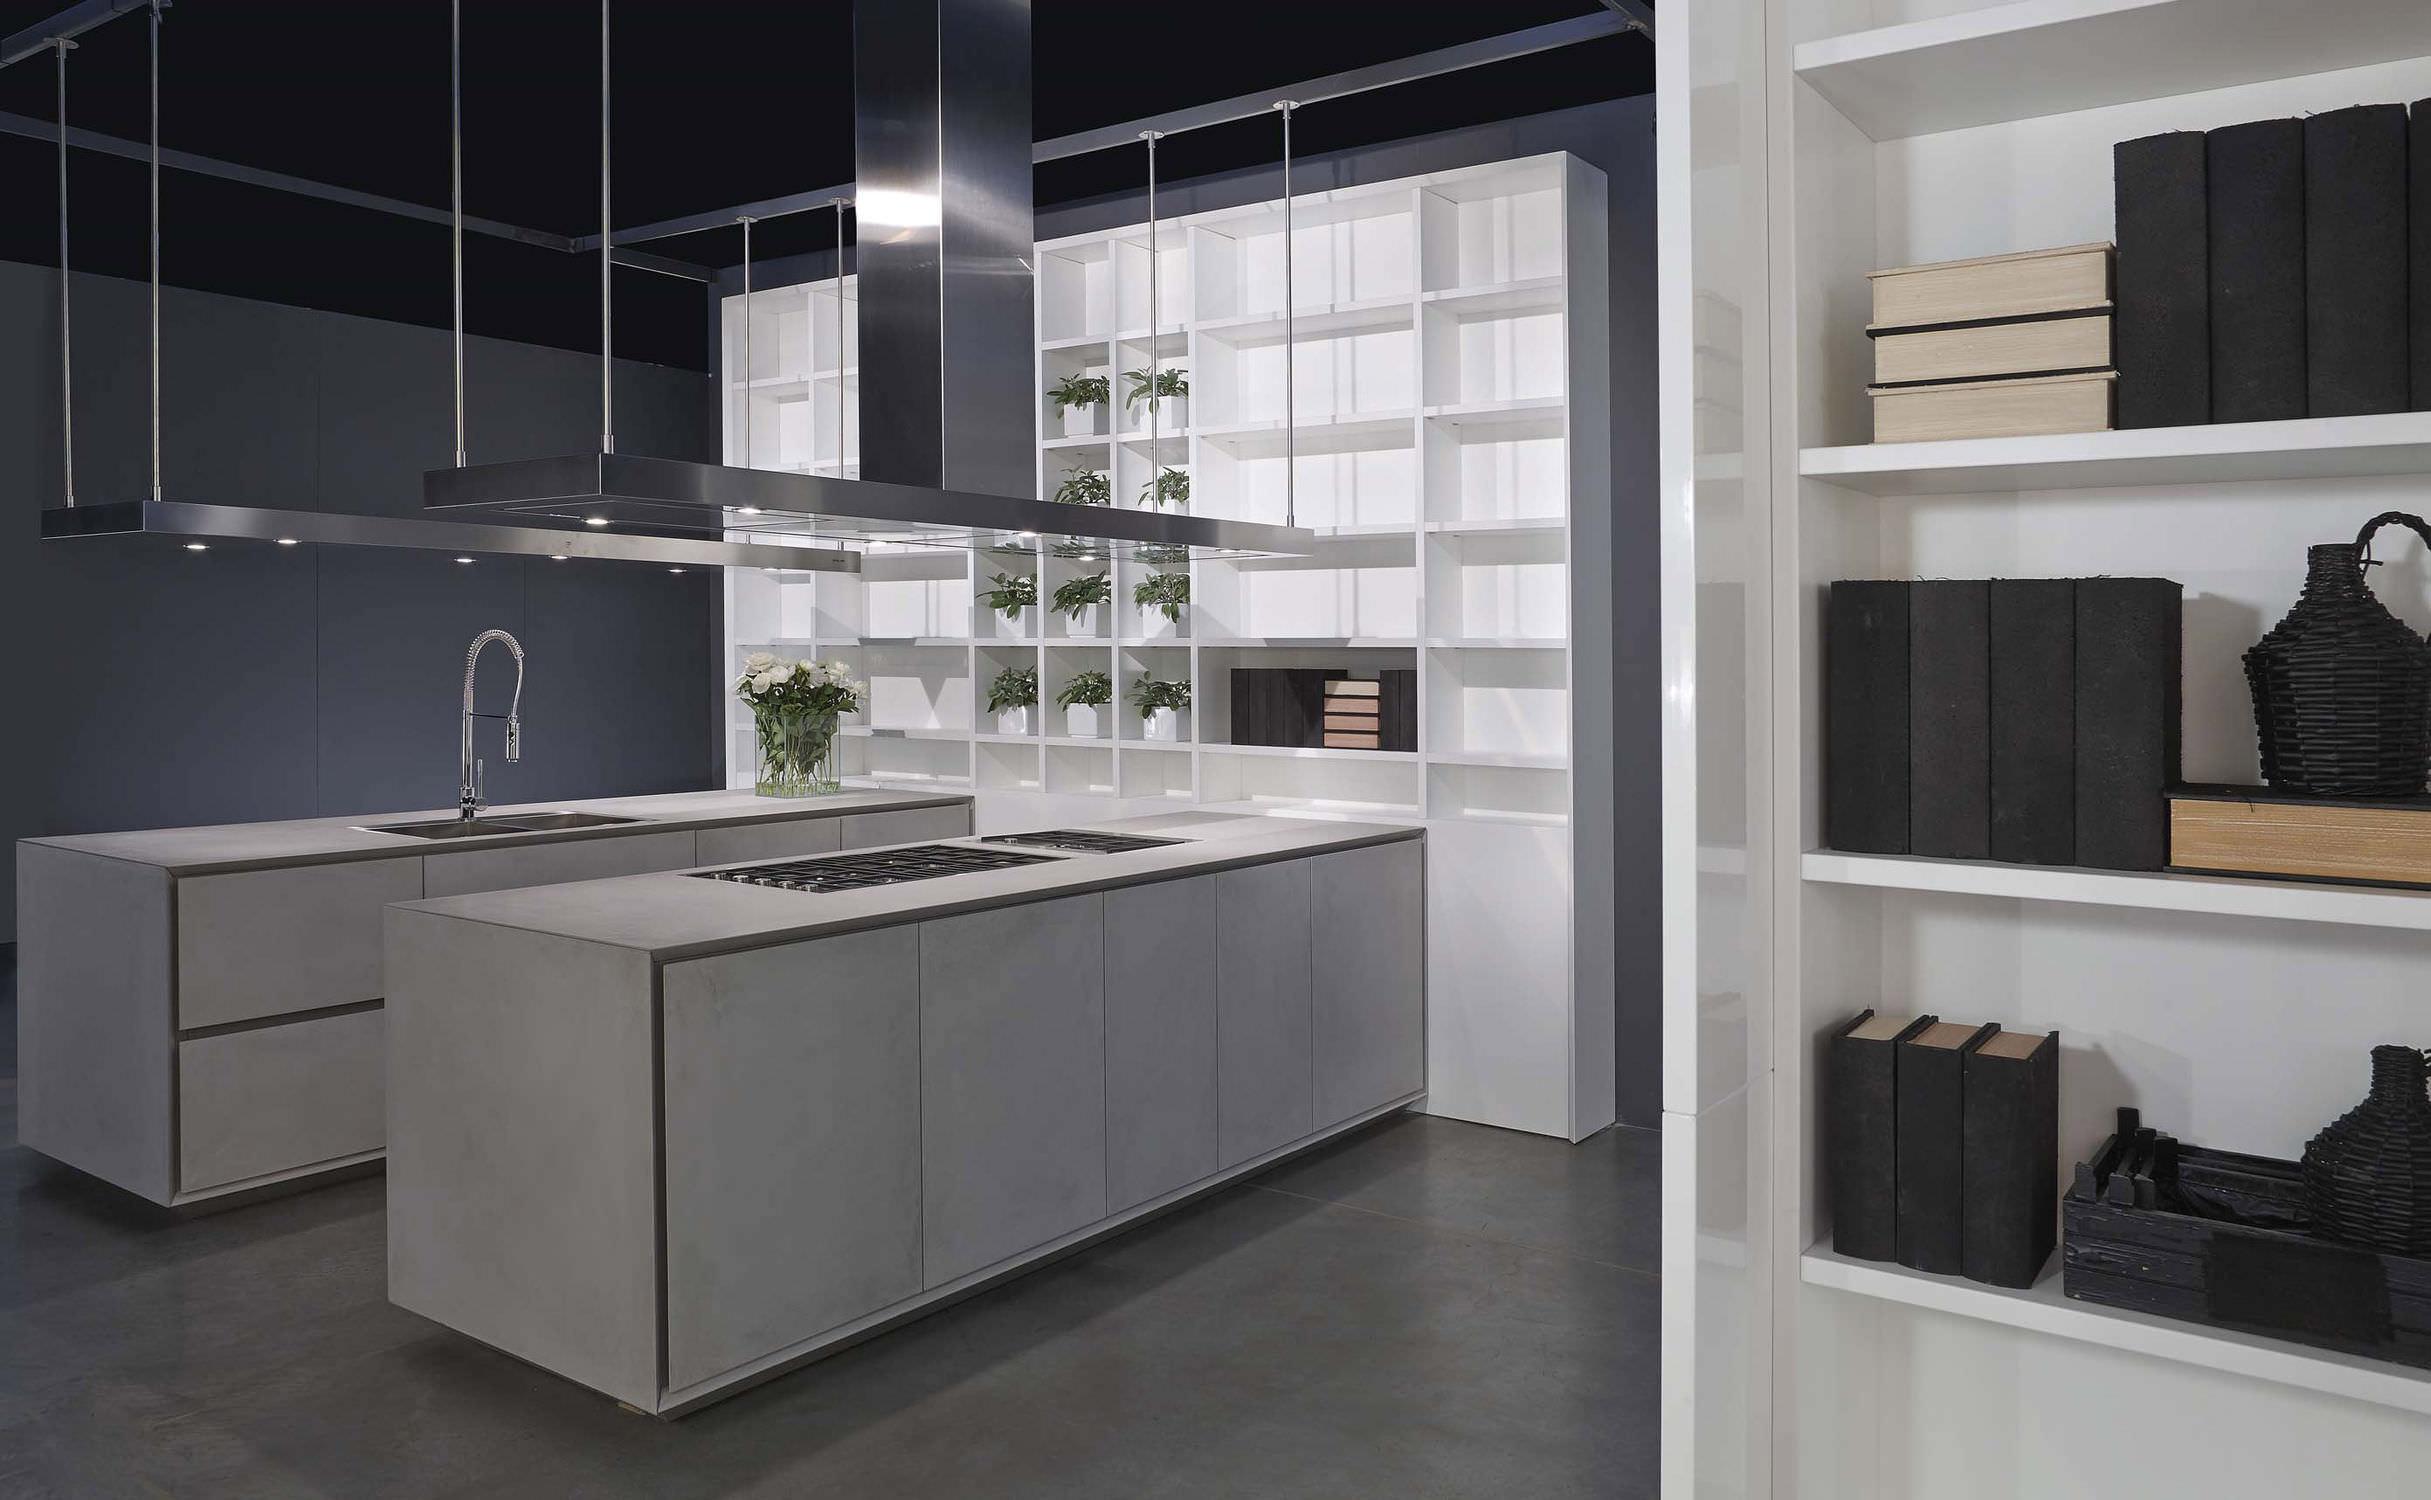 ... Moderne Küche / Beton / Kochinsel / Lackiert ...